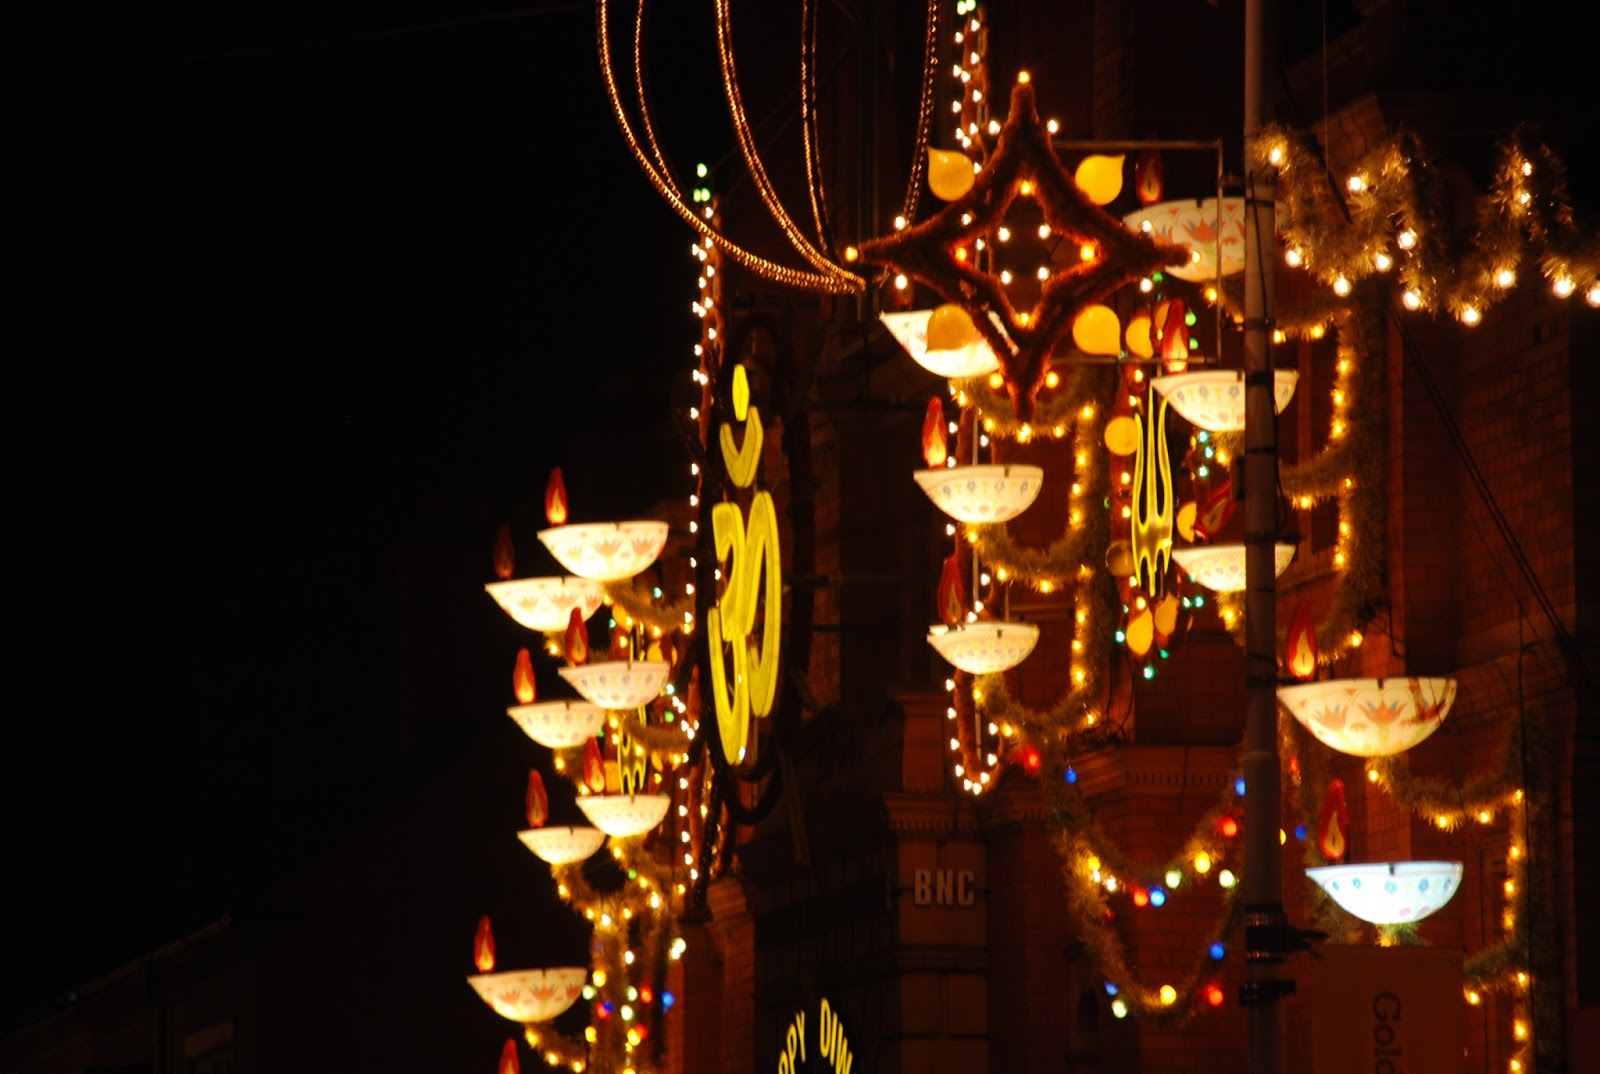 Diwali Decoration Items Online: Foundation Dezin & Decor...: Diwali Decorations 2015